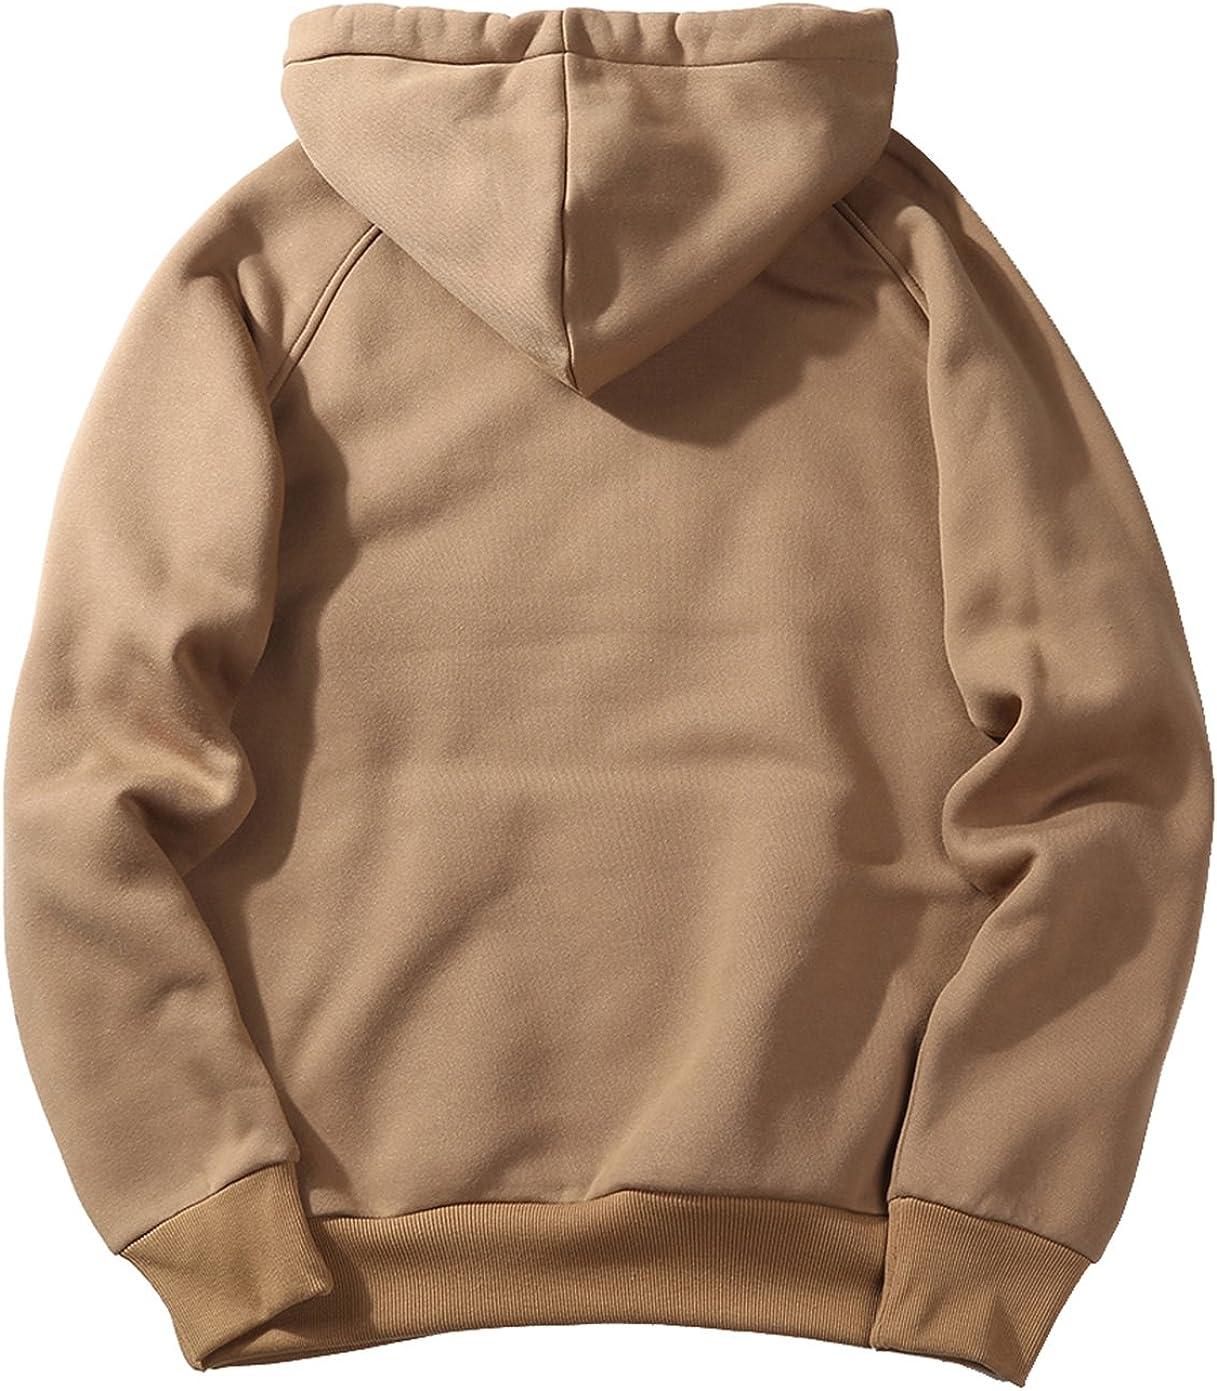 xueshankeji Hip Hop Dabbing Cat Dark Grey Sweater Hoodie For Mans XL